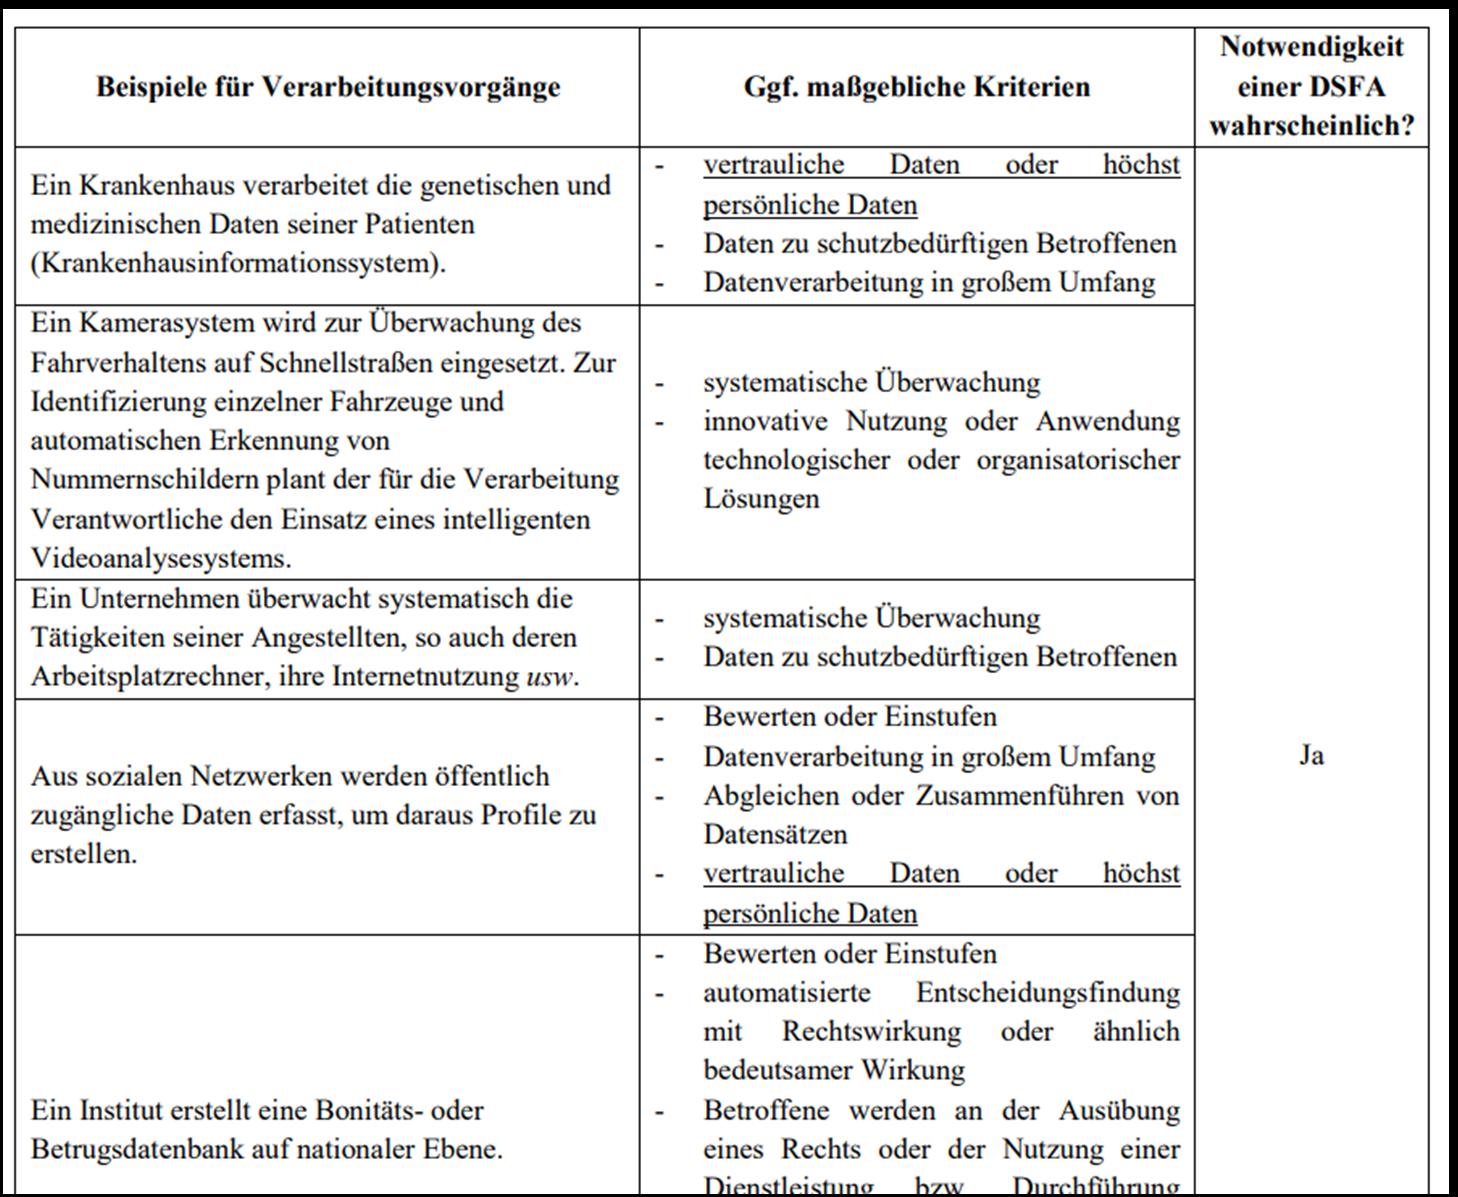 Screenshot Auszug aus dem Working Paper 248 - Praxisbeispiele